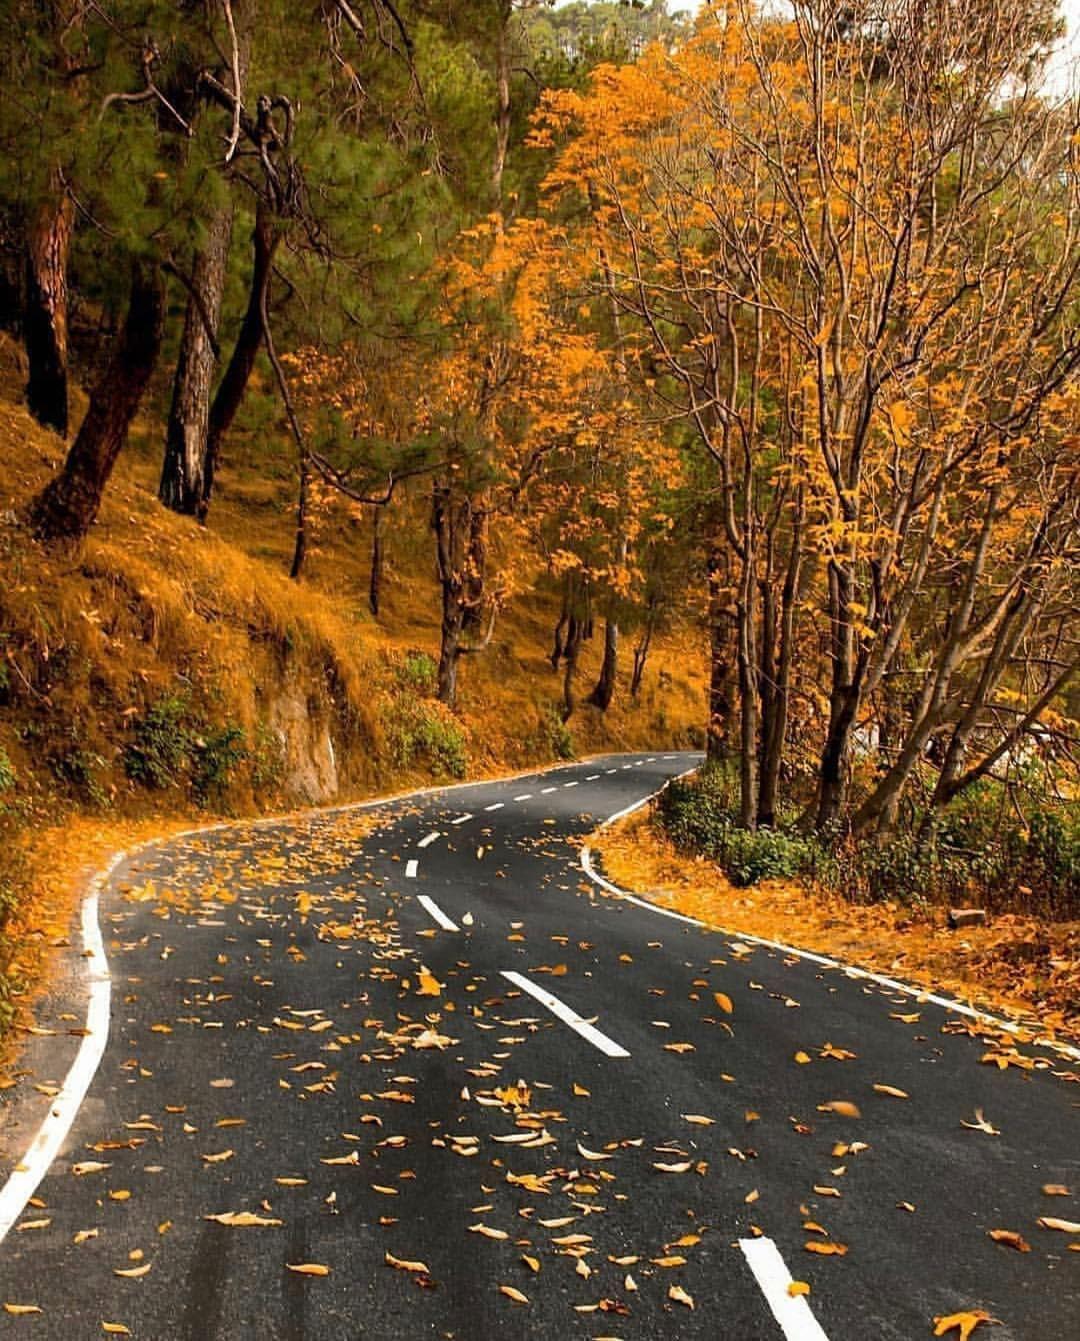 Autumn Cozy, Country Roads